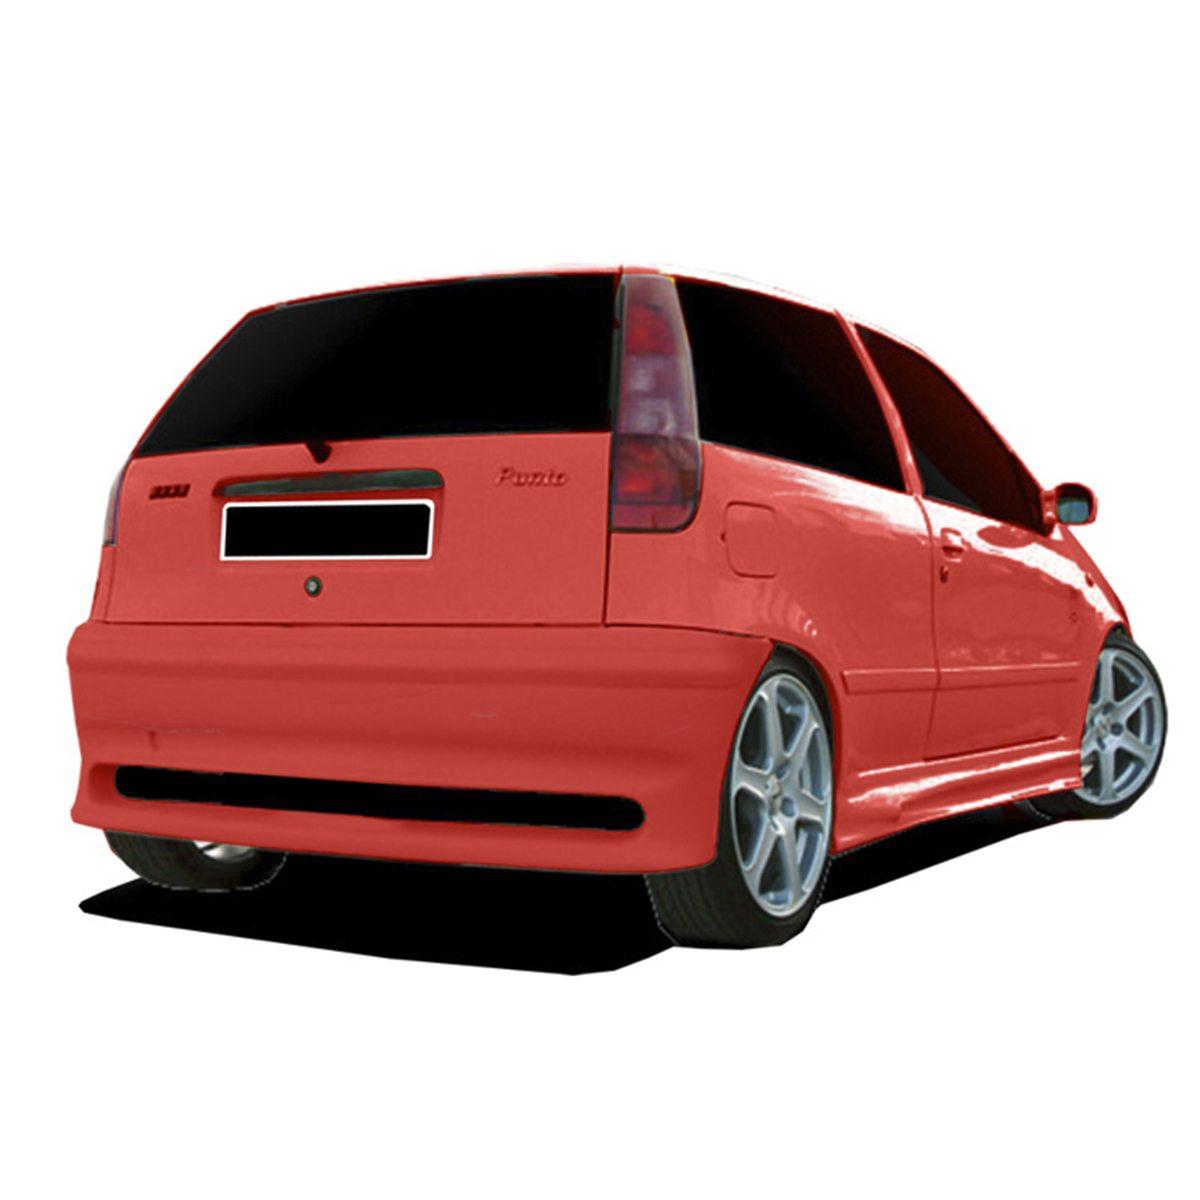 Fiat-Punto-Spyder-Tras-SPA014-1